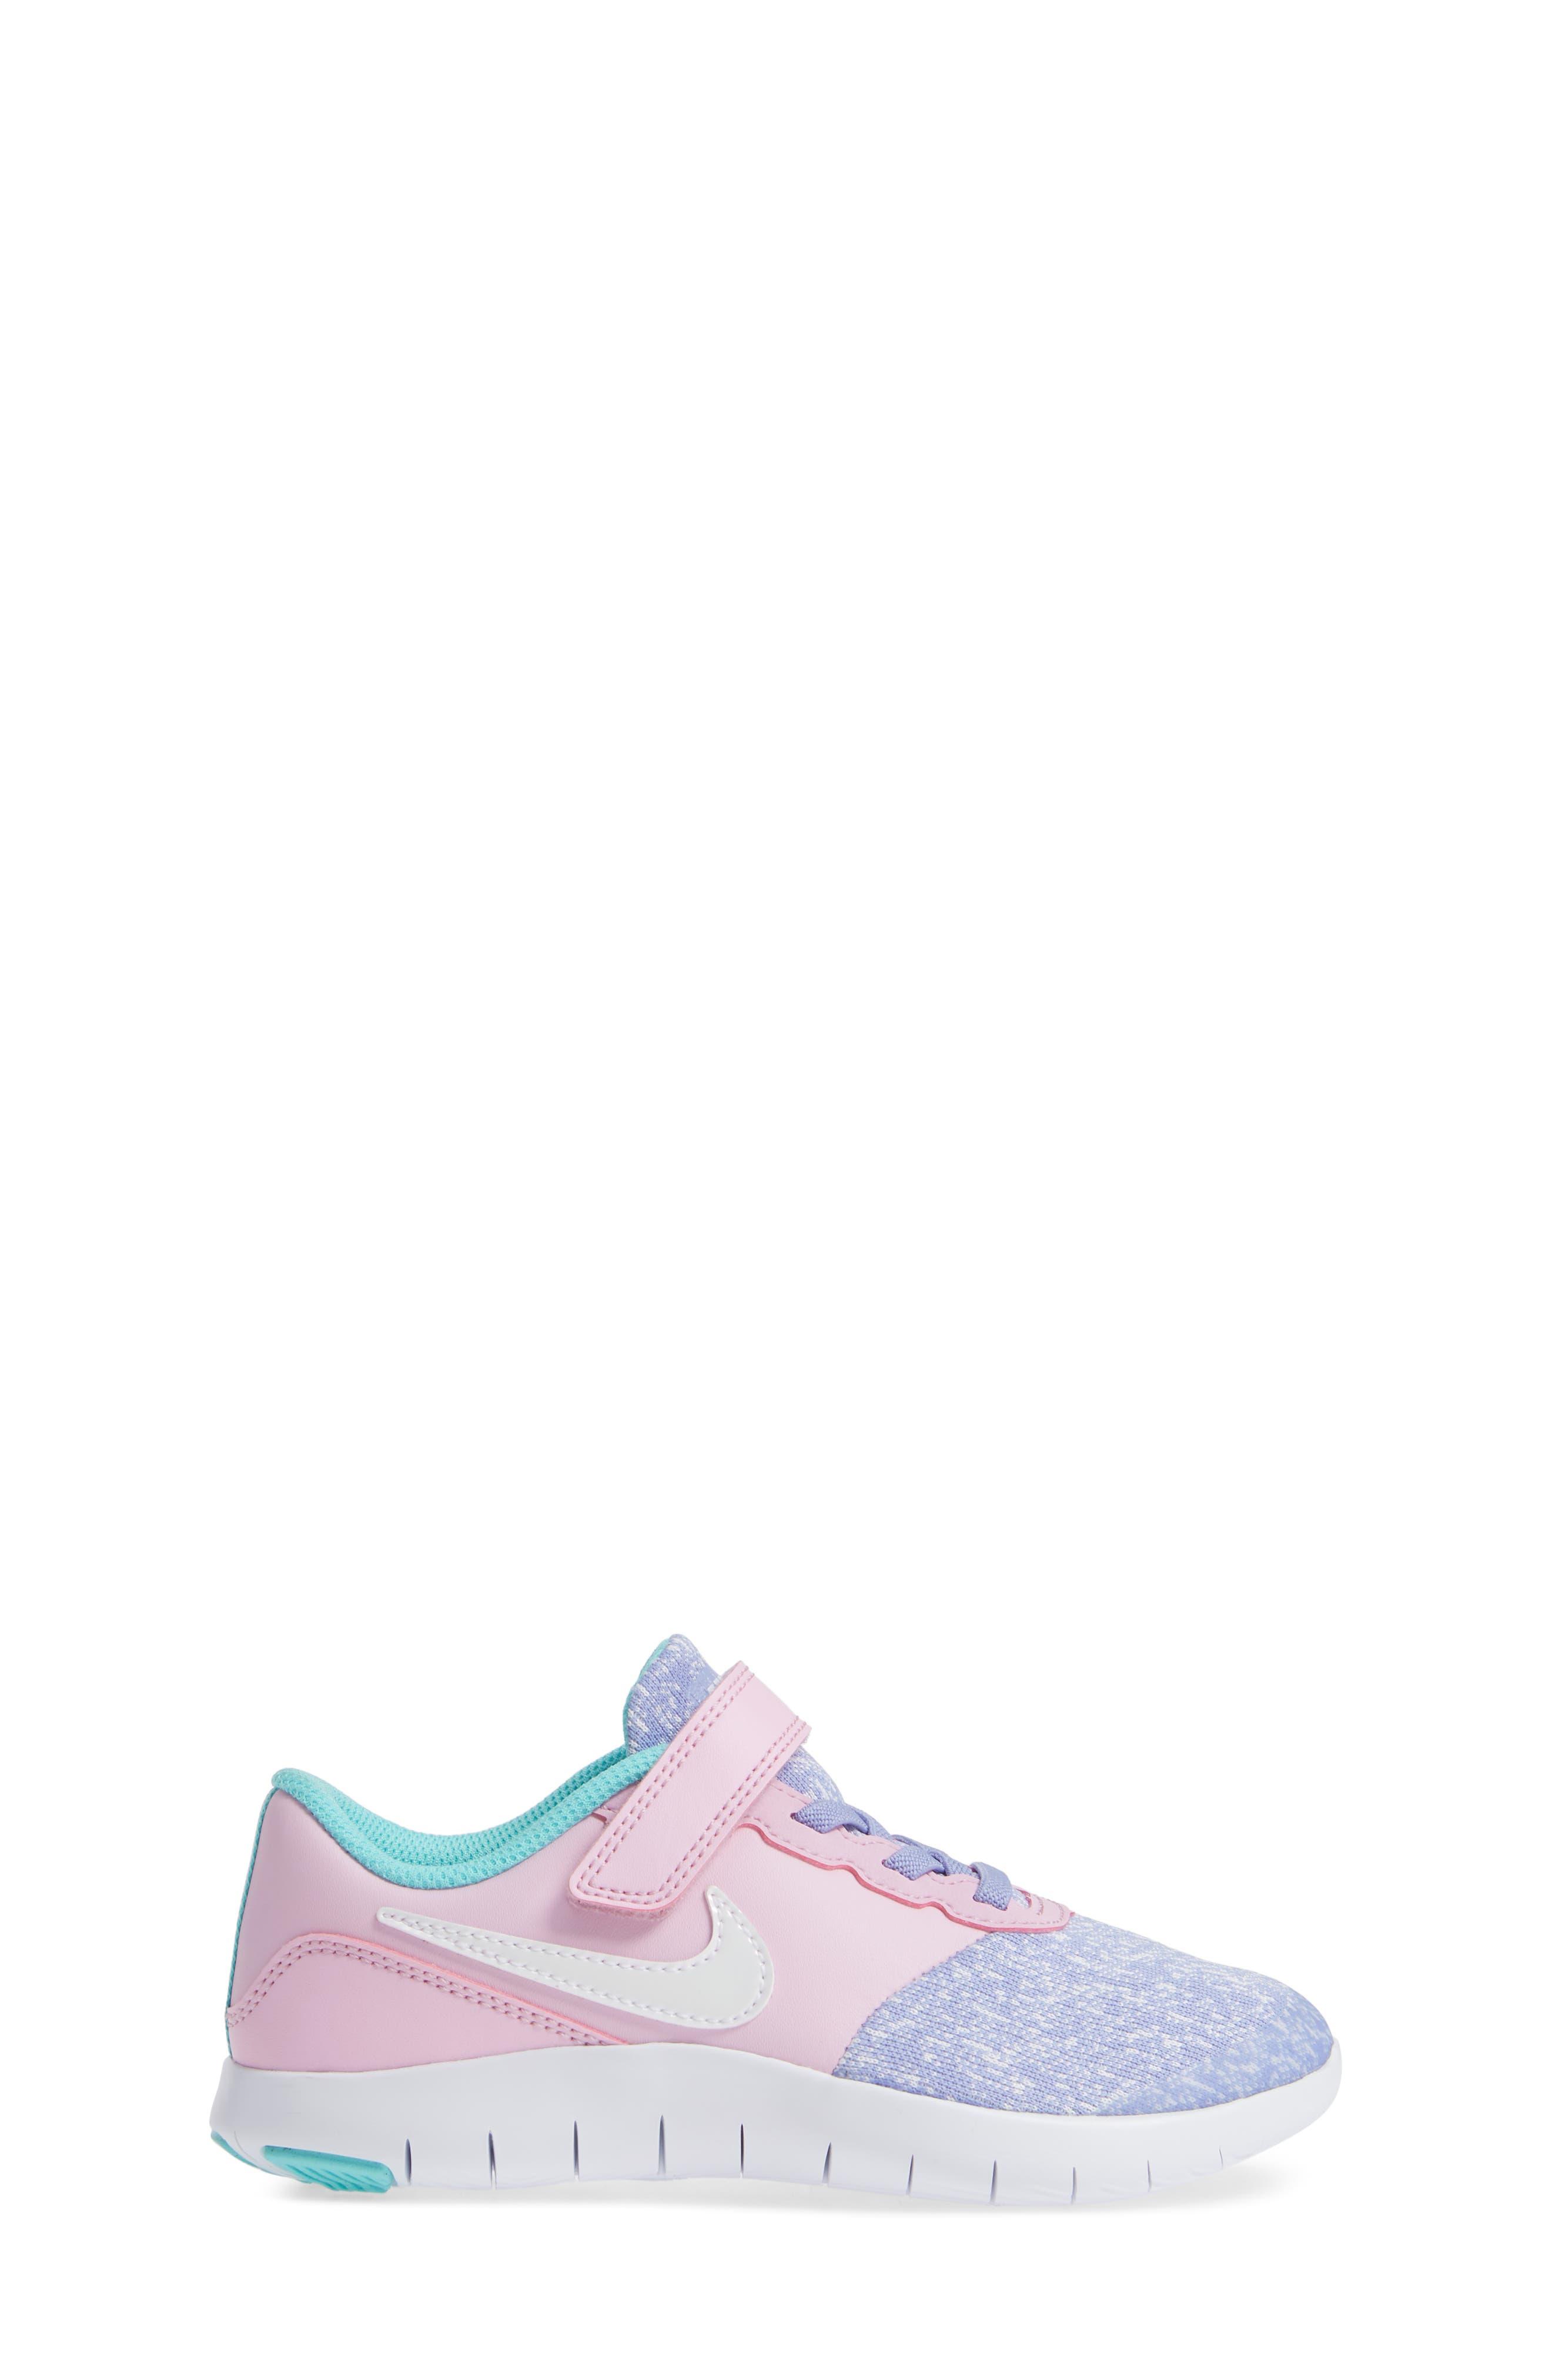 NIKE, Flex Contact Running Shoe, Alternate thumbnail 3, color, TWILIGHT PULSE WHITE AQUA